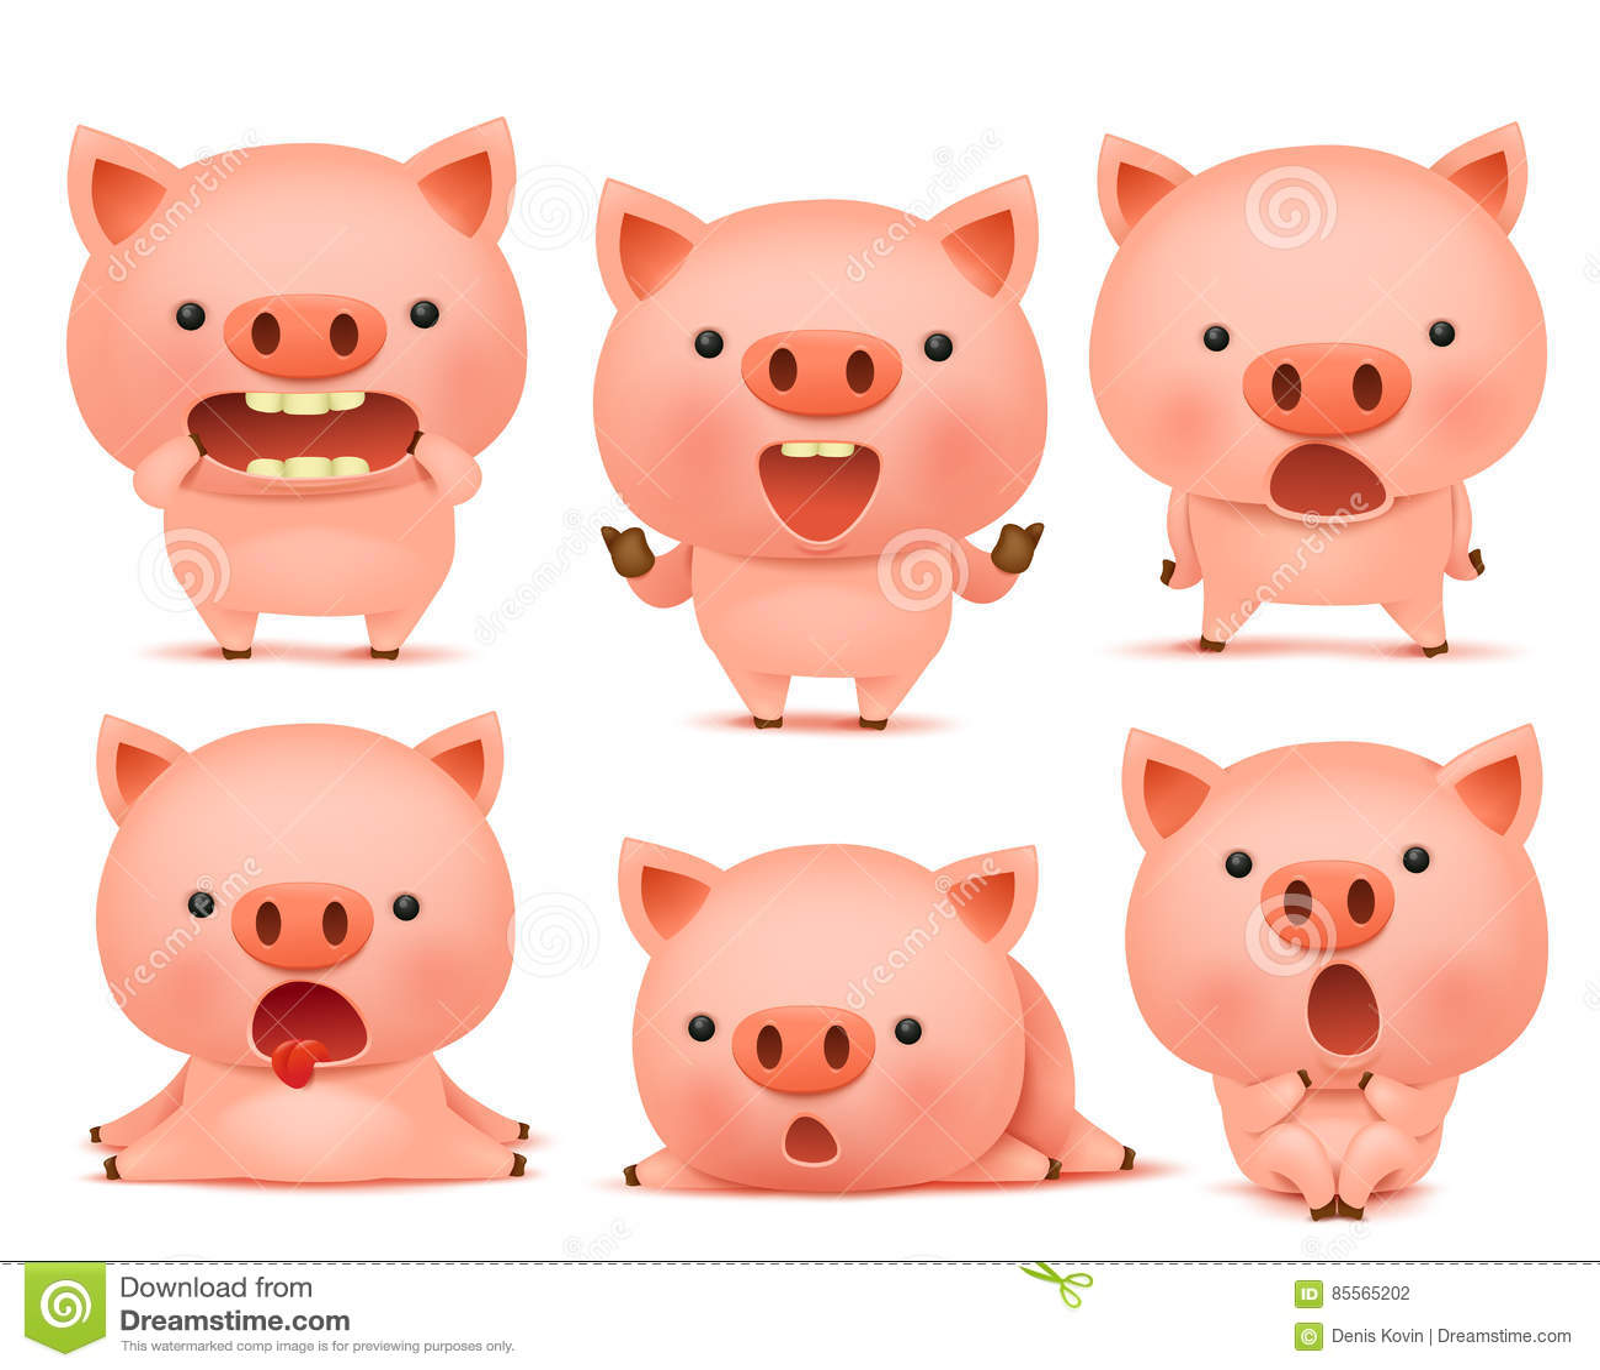 ideal wallpaper emoji pig ideas best wallpaper hd